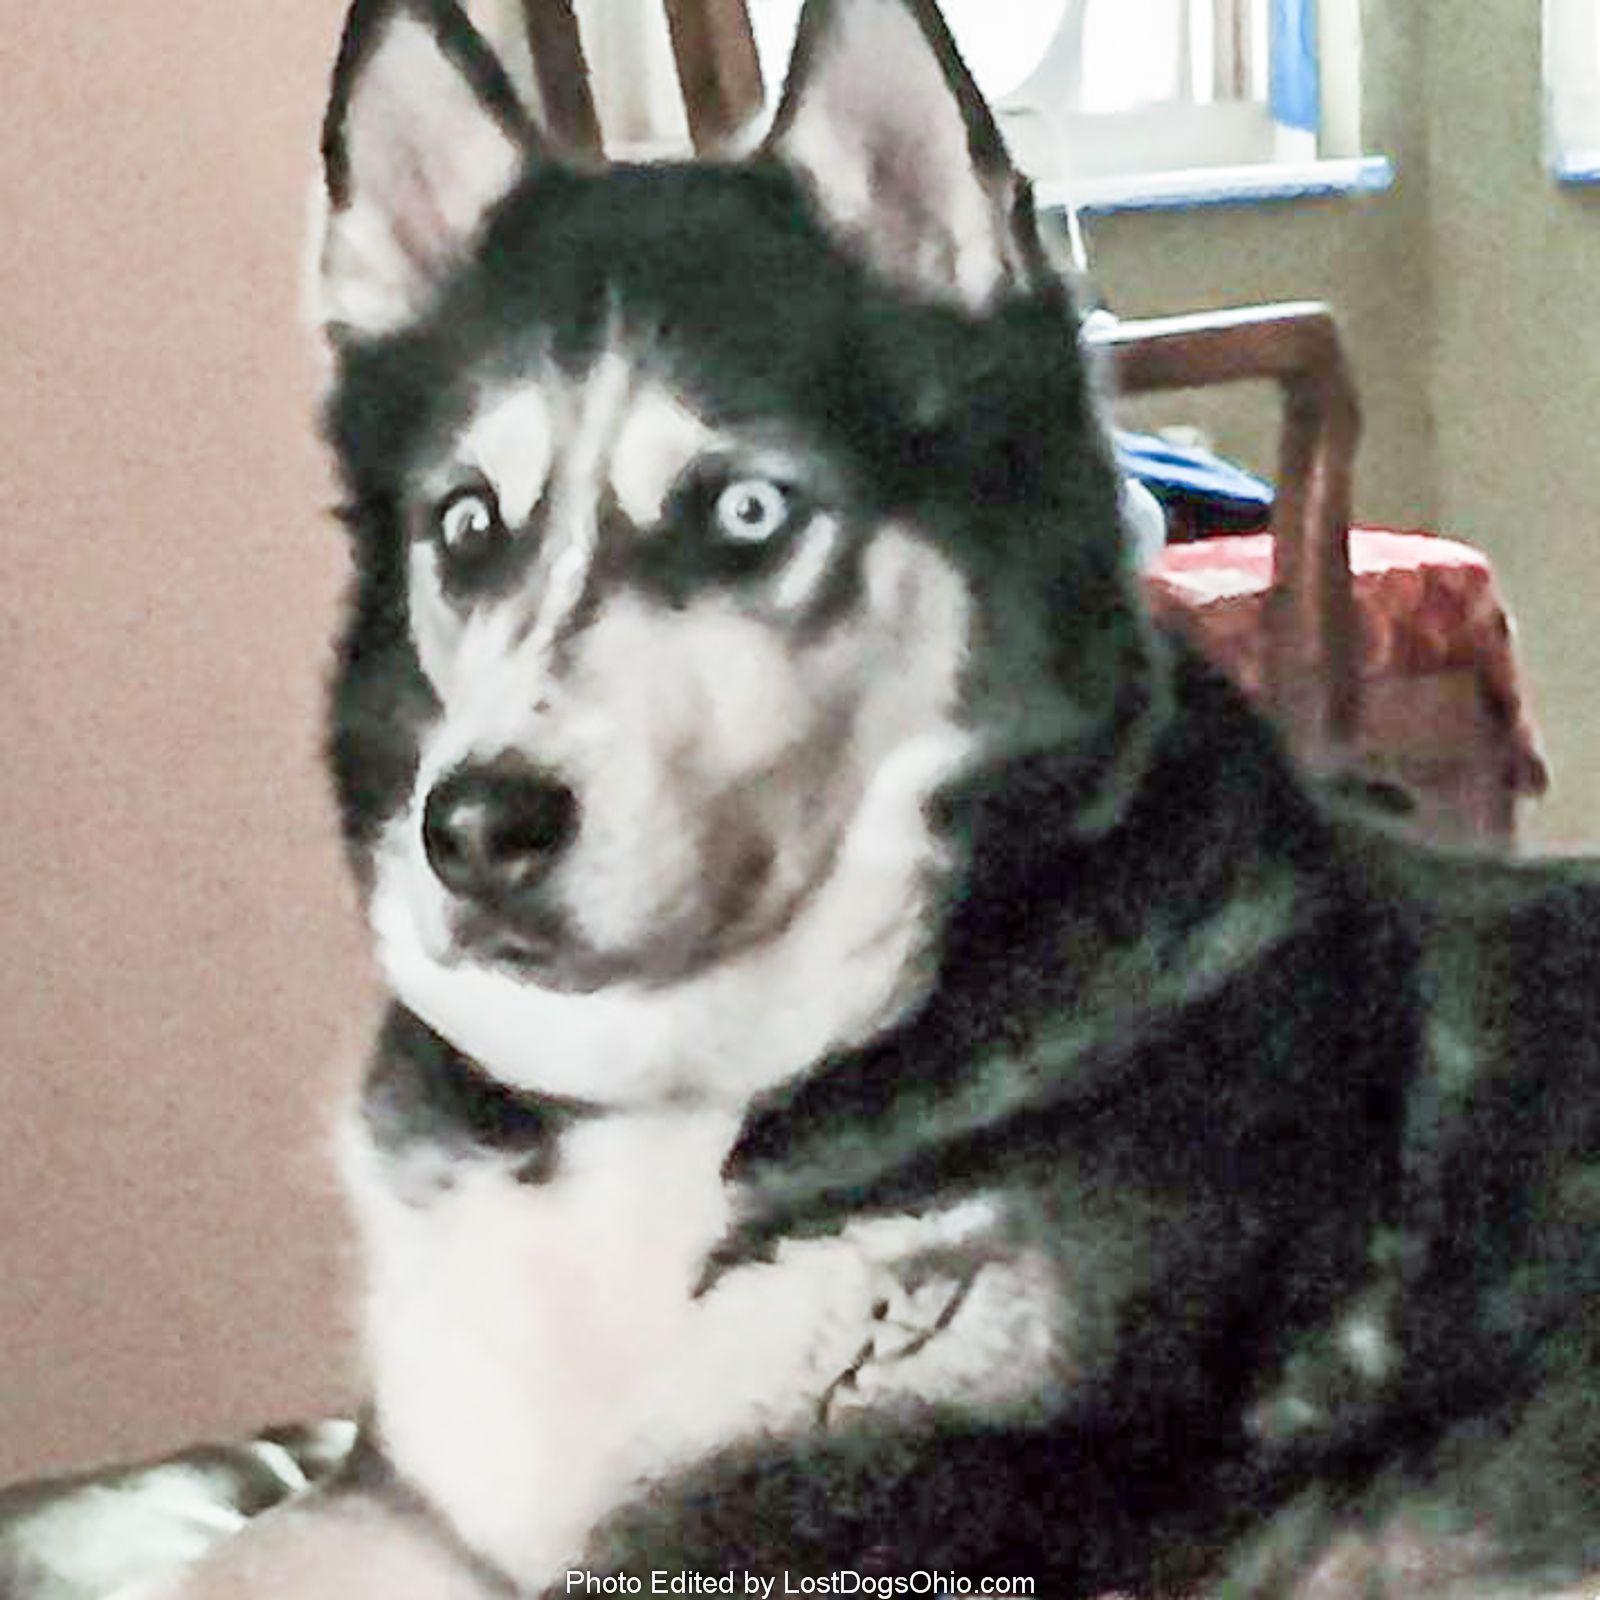 Lost Dog Female Saint Paris Oh Usa 43072 Last Seen Park Ave